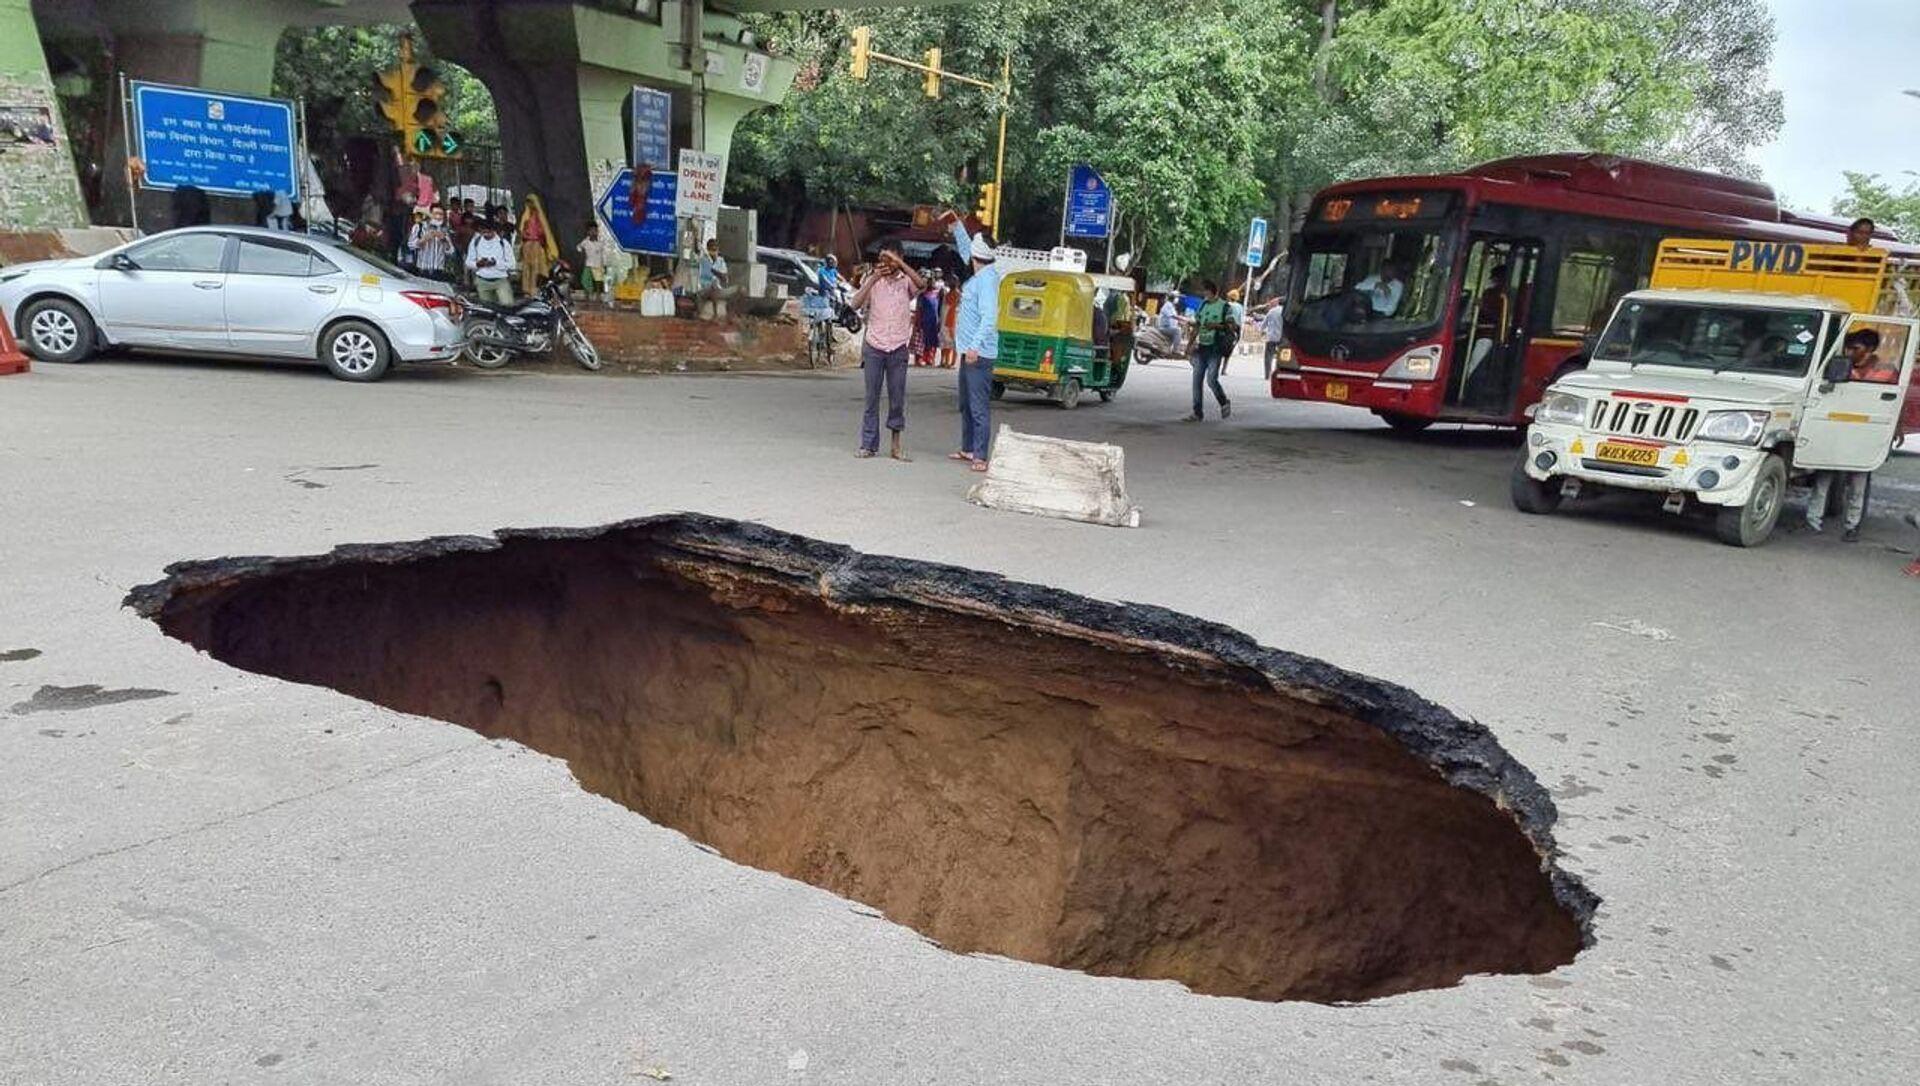 New Delhi Suffers Traffic Disruption as Massive Sinkhole Appears on City Street - Photos - Sputnik International, 1920, 31.07.2021